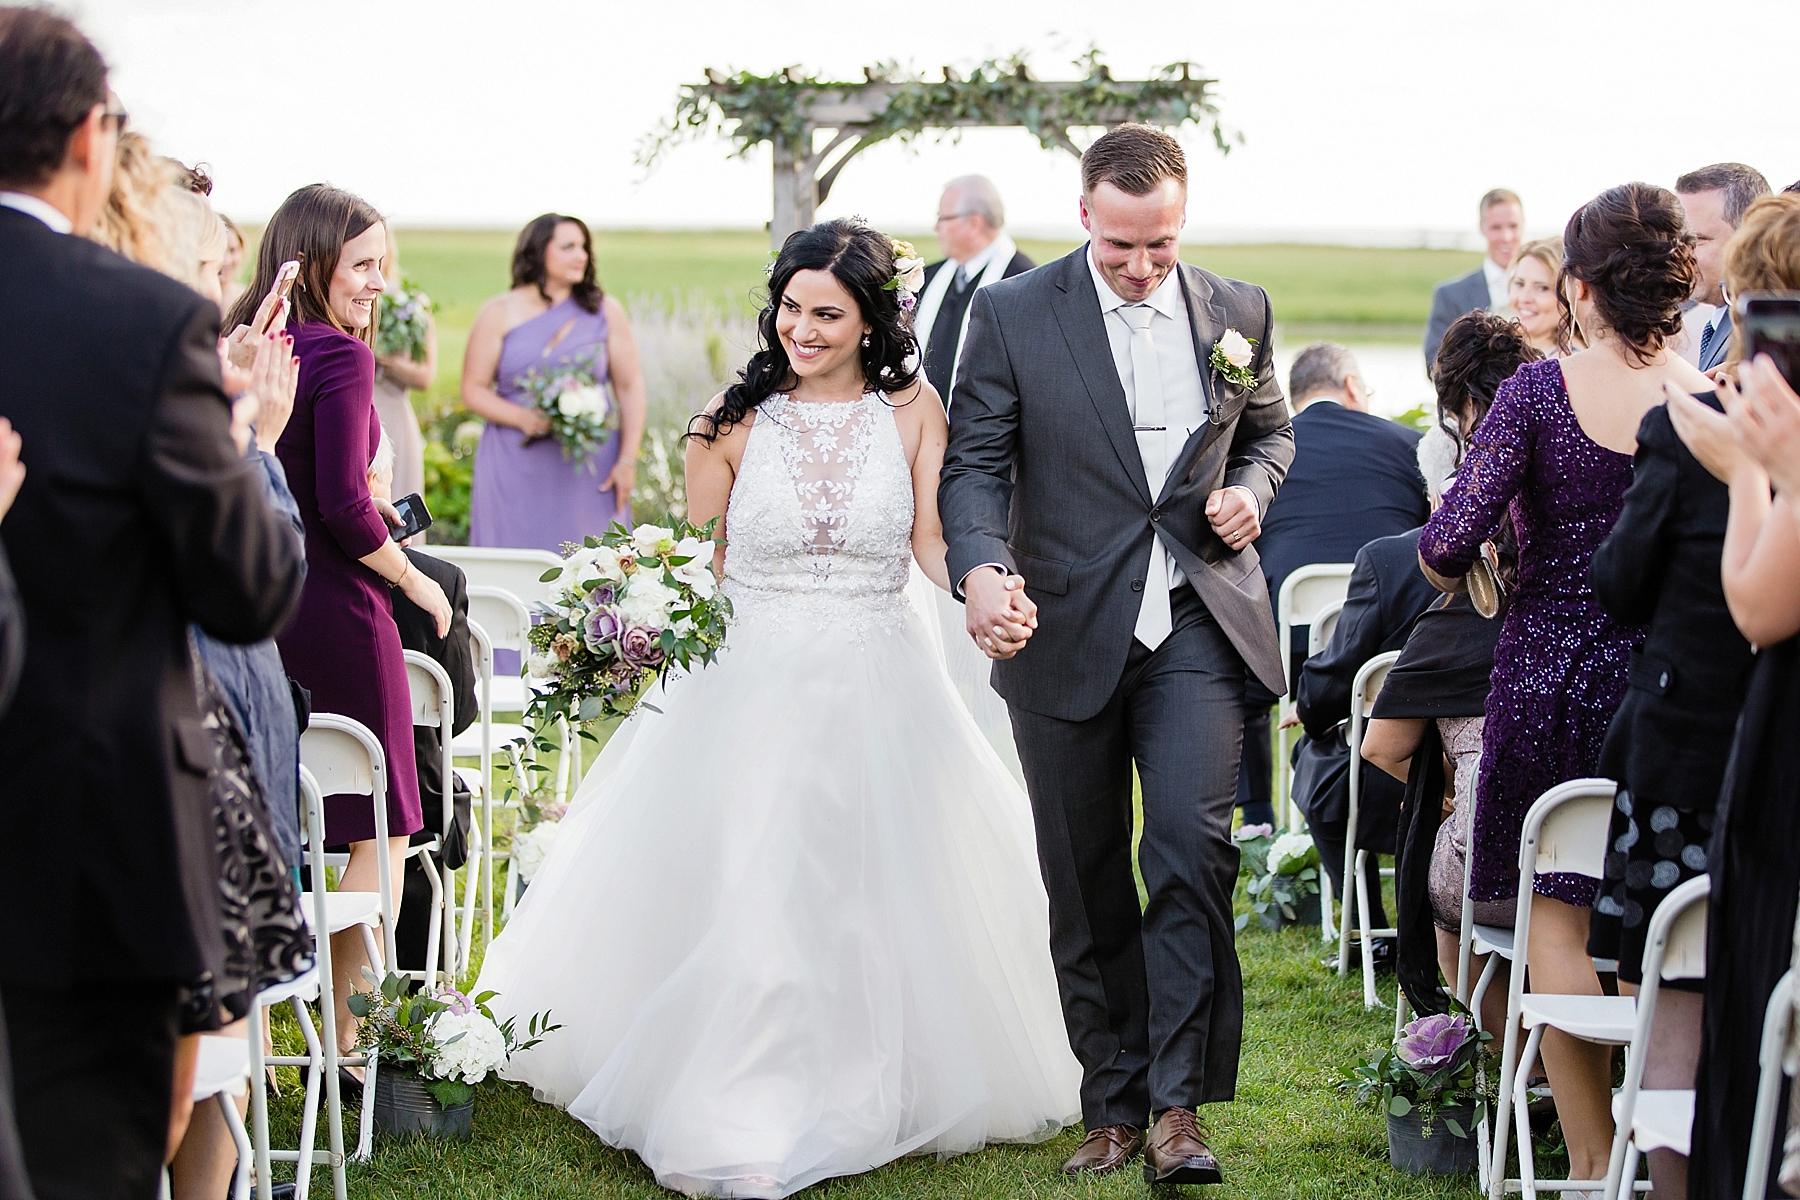 windsor-wedding-photographer-sprucewood-shores-winery-wedding-niagara-on-the-lake-wedding-photographer-eryn-shea-photography_0057.jpg